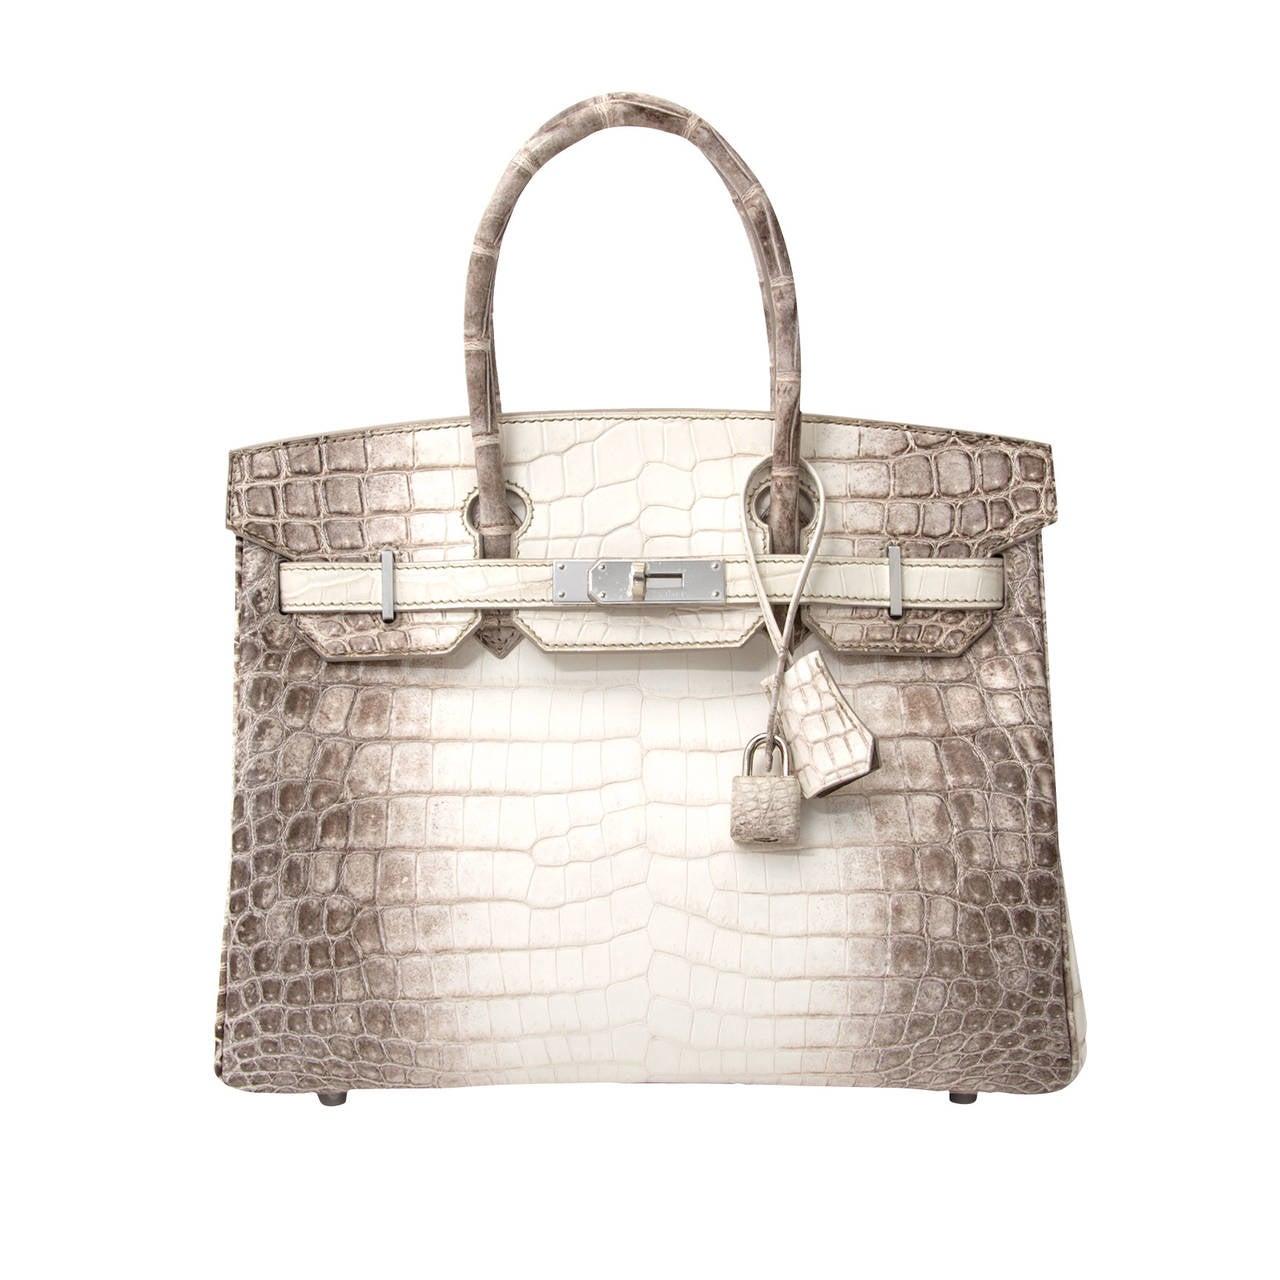 herm s birkin bag crocodile niloticus himalaya handbag white phw 30 for sale at 1stdibs. Black Bedroom Furniture Sets. Home Design Ideas